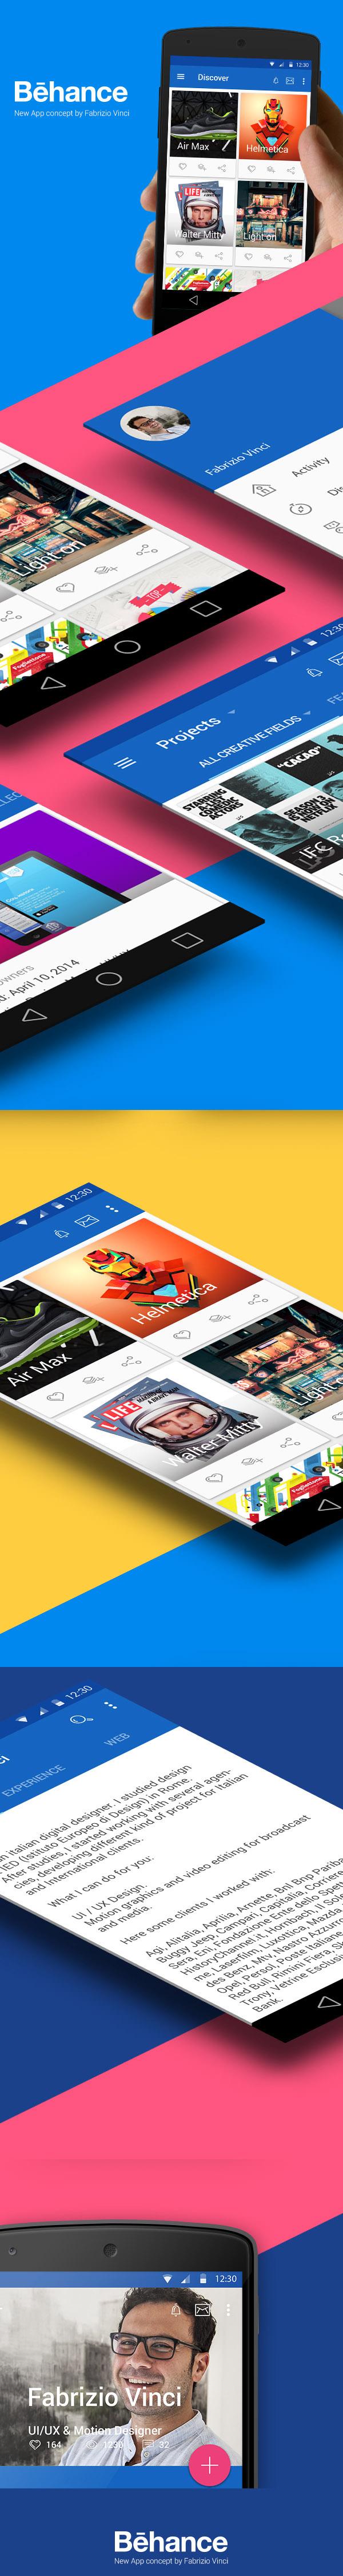 behance new app concept